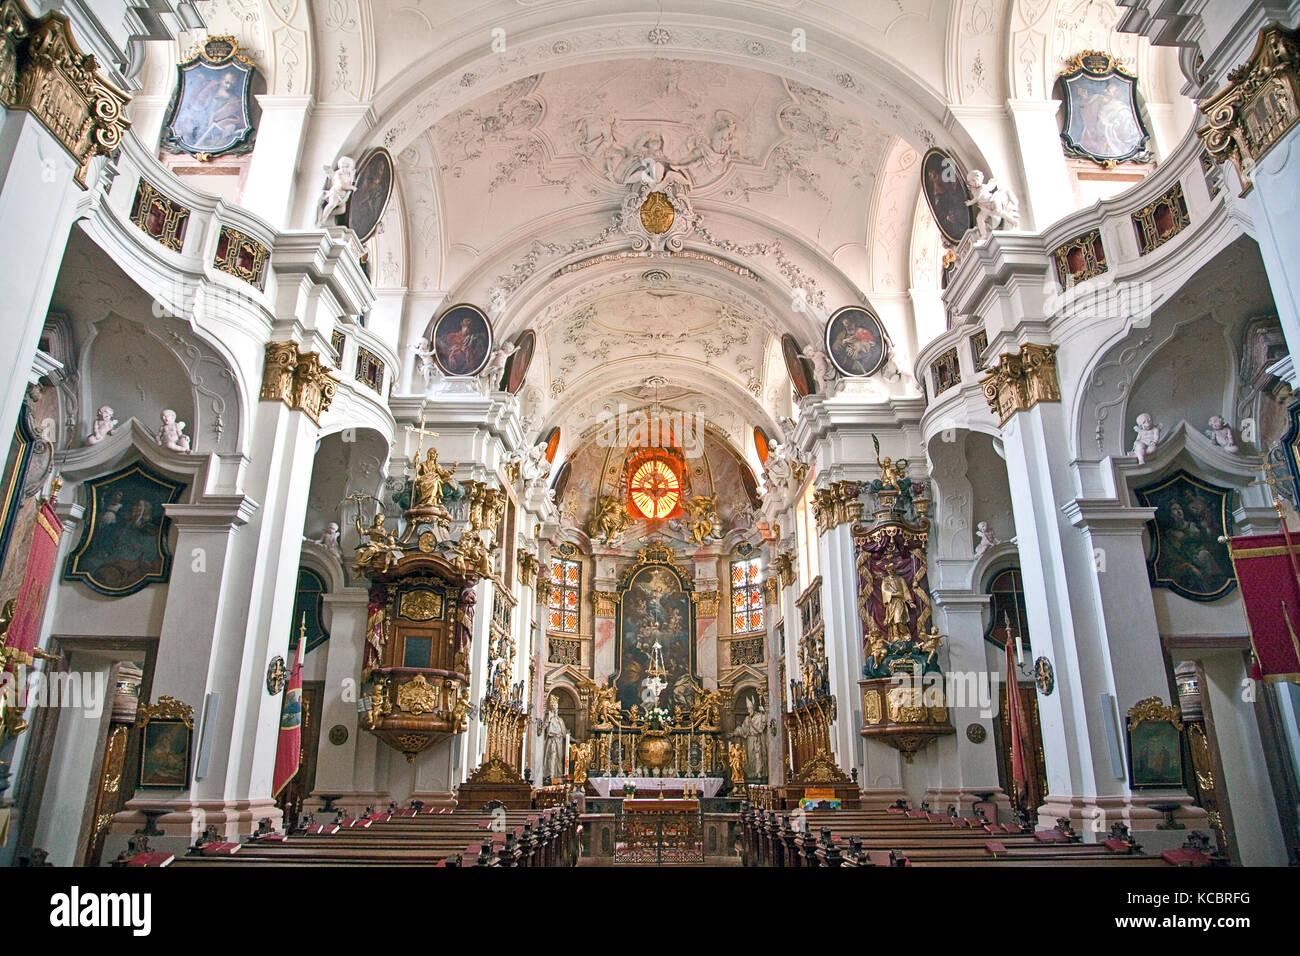 Wachau Valley, Austria:  Interior views of the Durnstein Monastery church, built between 1720-1733 in the baroque - Stock Image